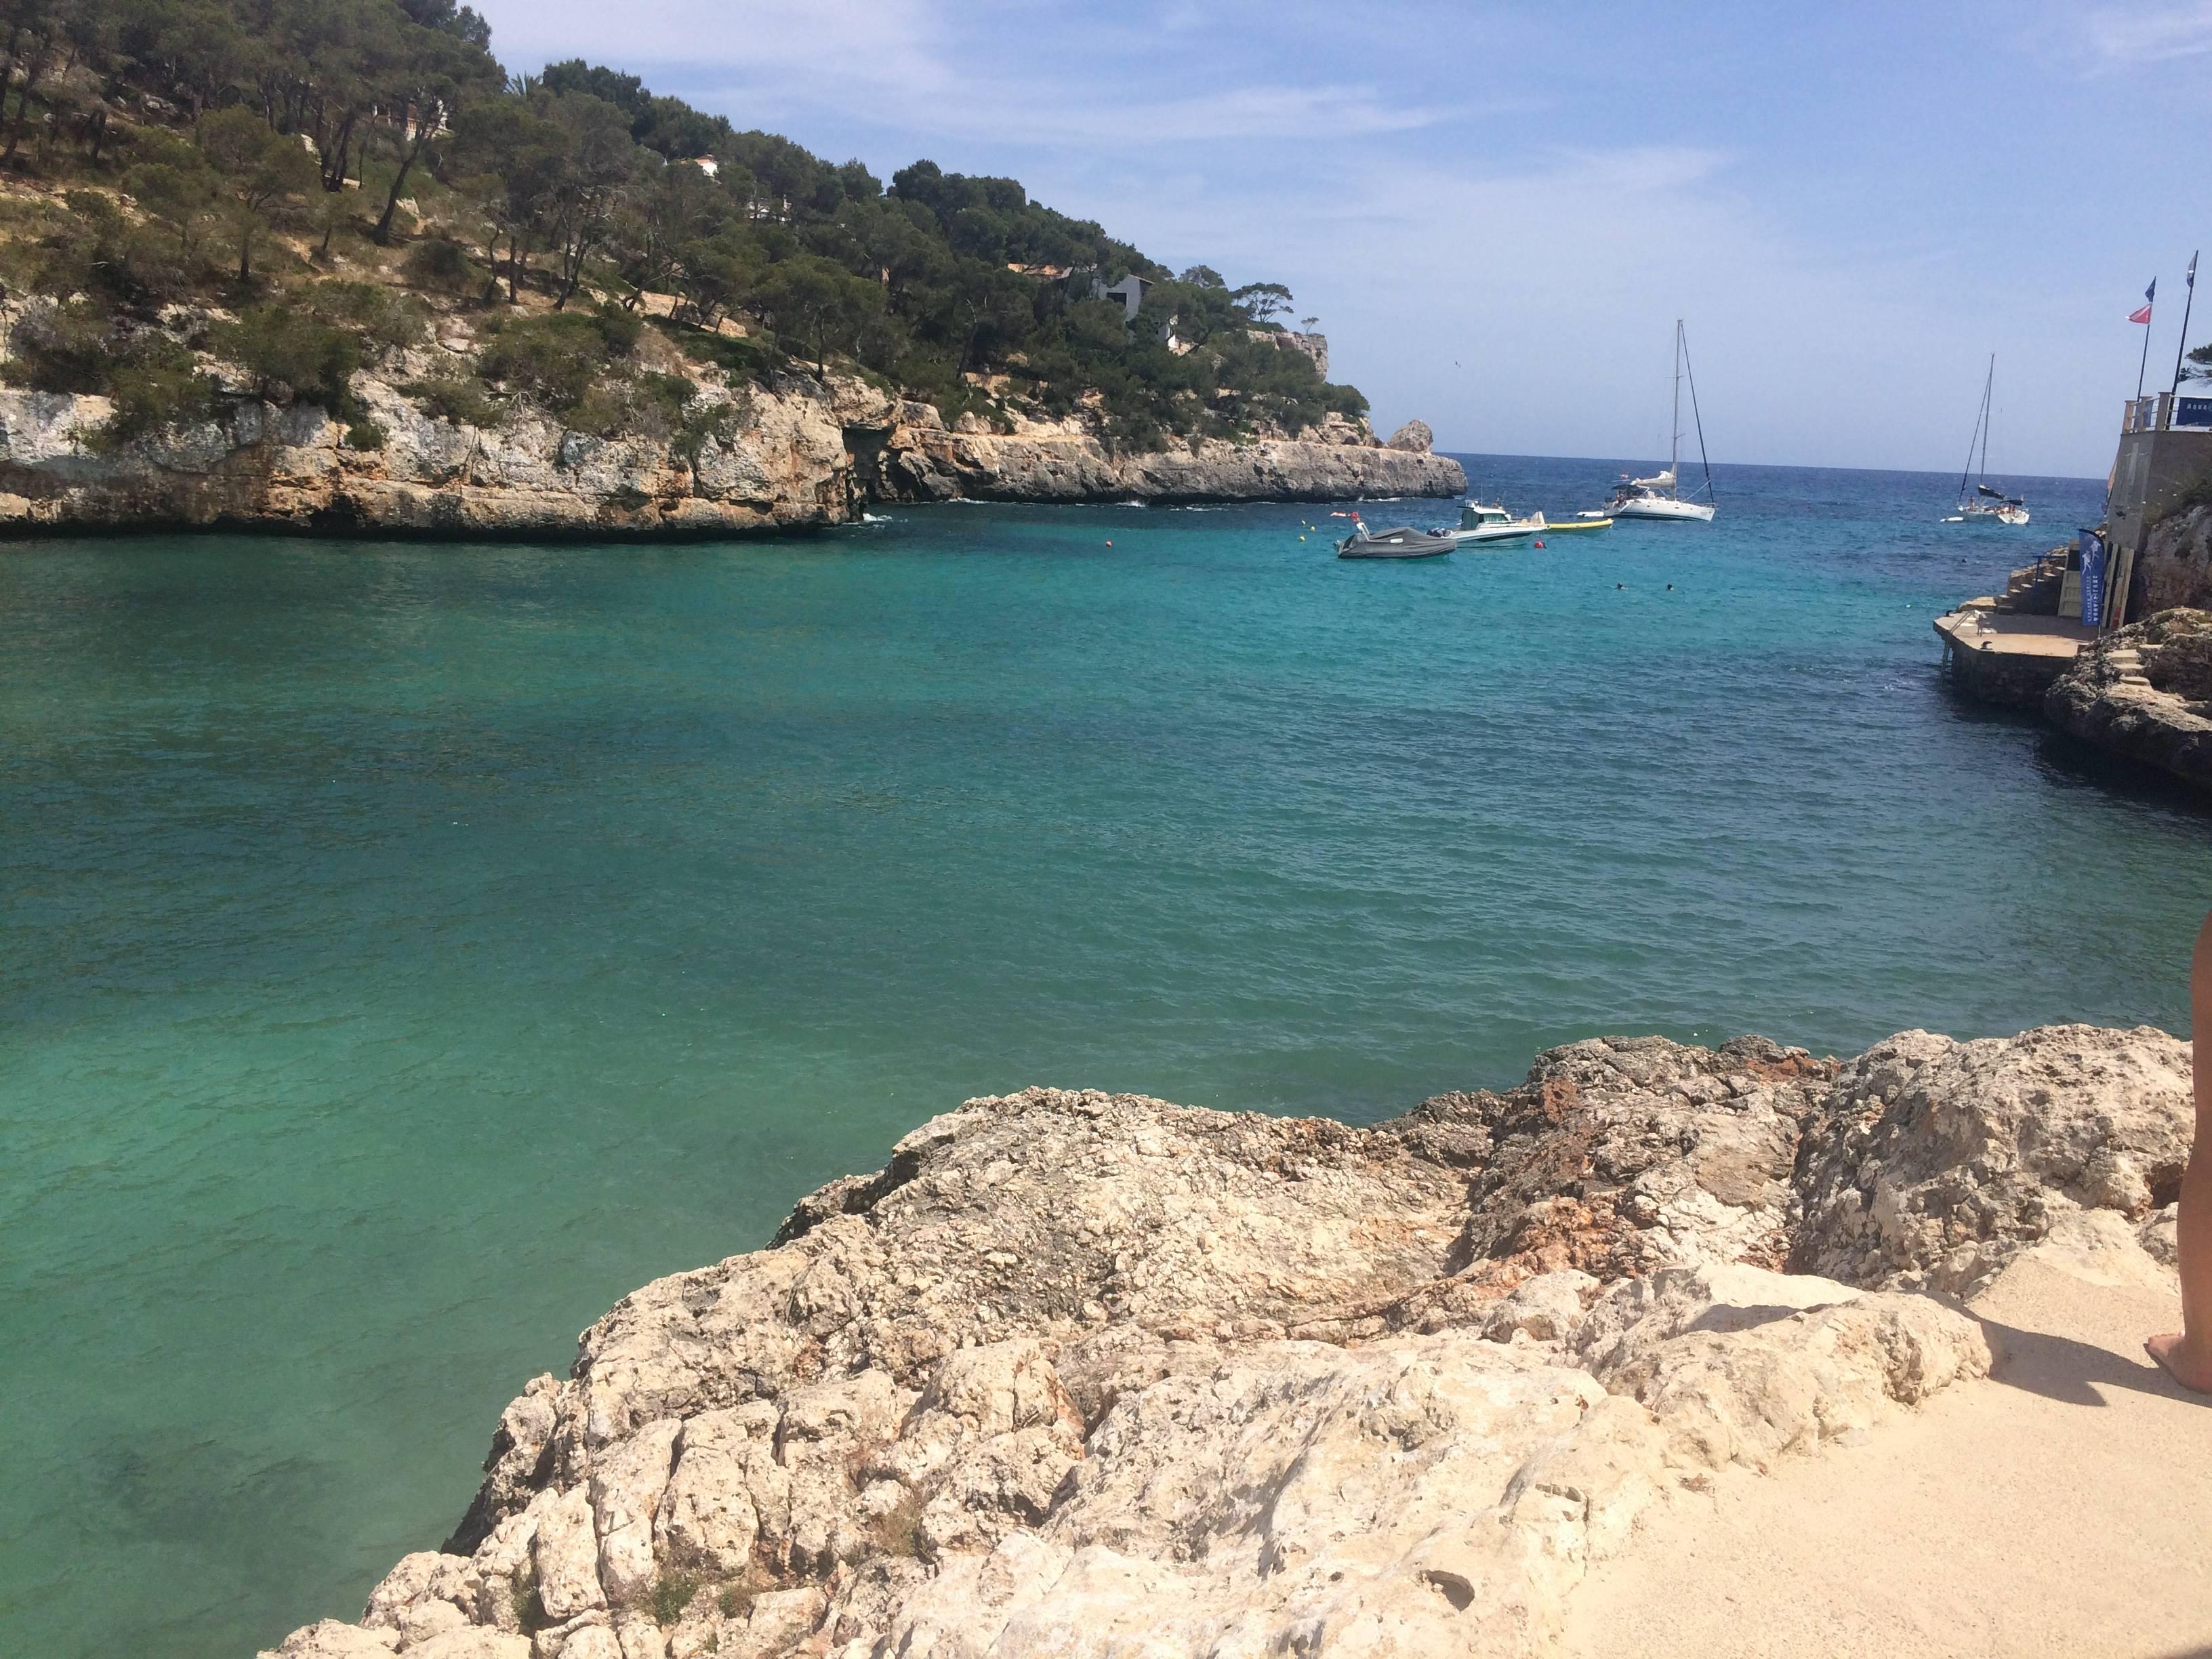 Photo 2: Cala Santanyì, Mallorca